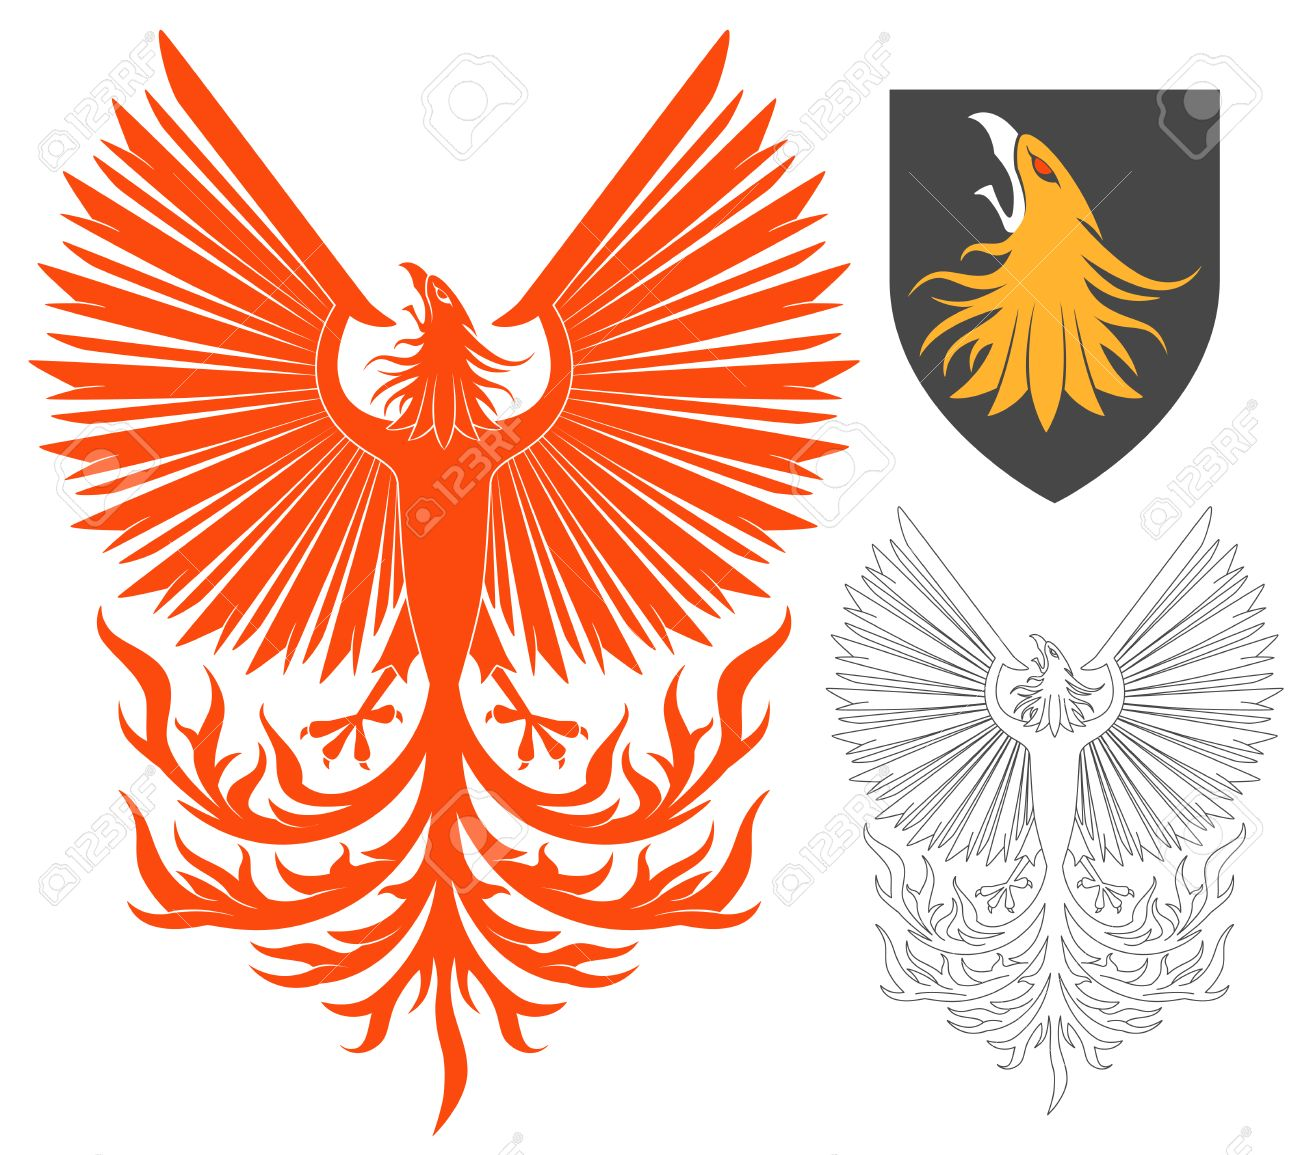 red soaring phoenix bird illustration for heraldry or tattoo